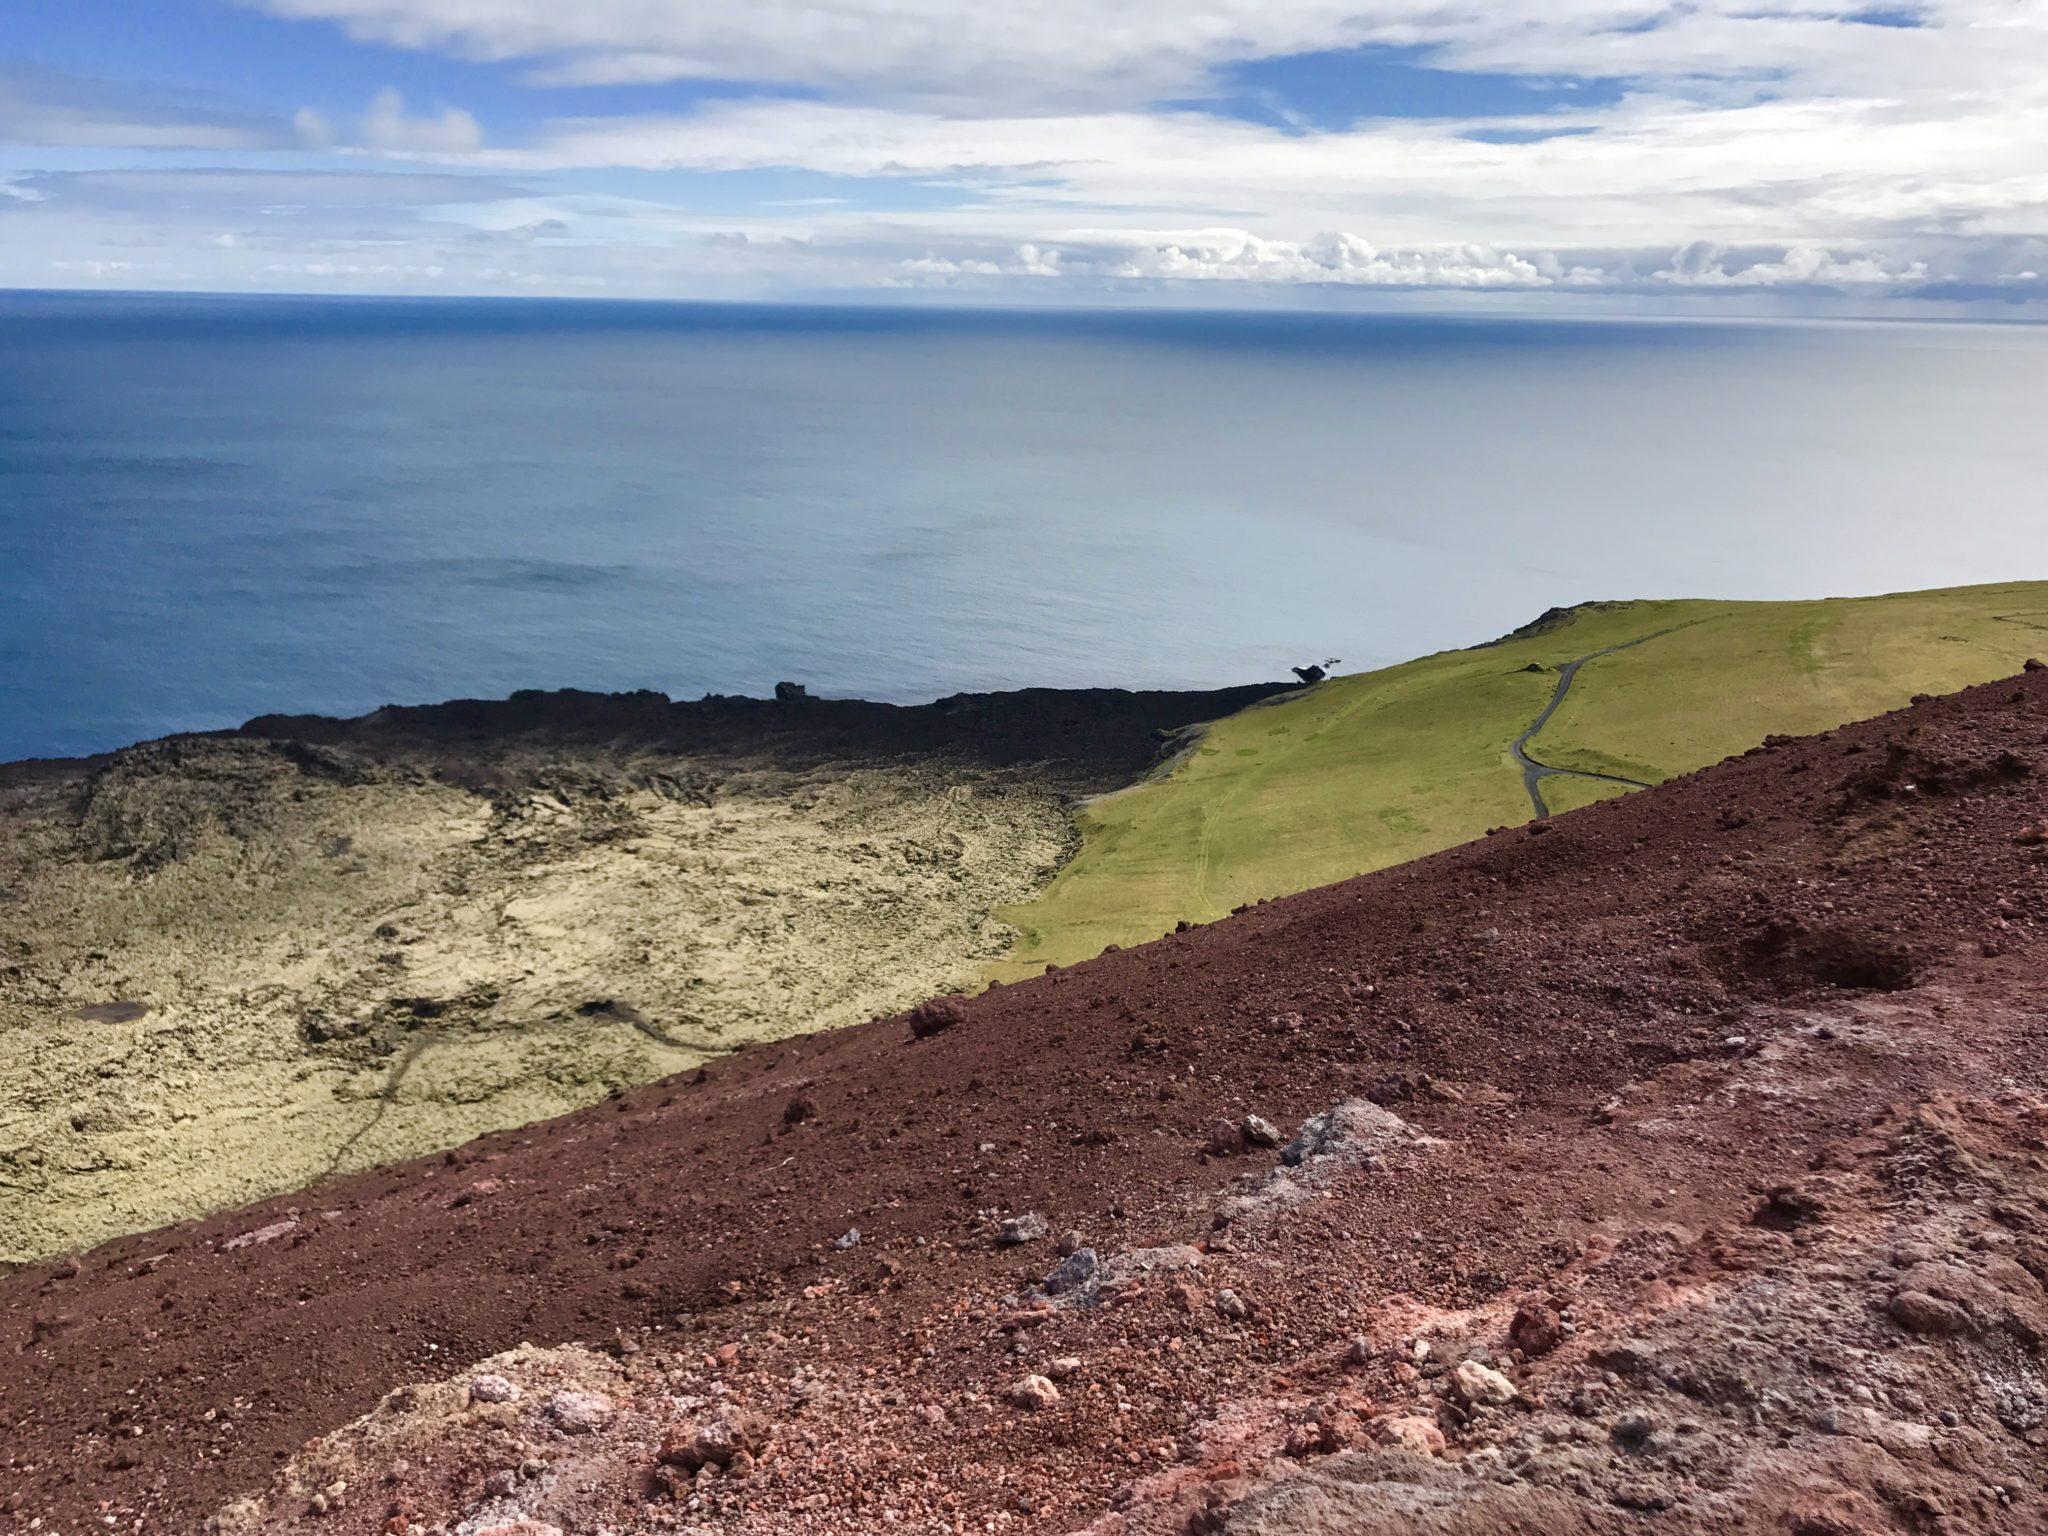 Islande jour 14 : Seljalandsfoss et îles Vestmann